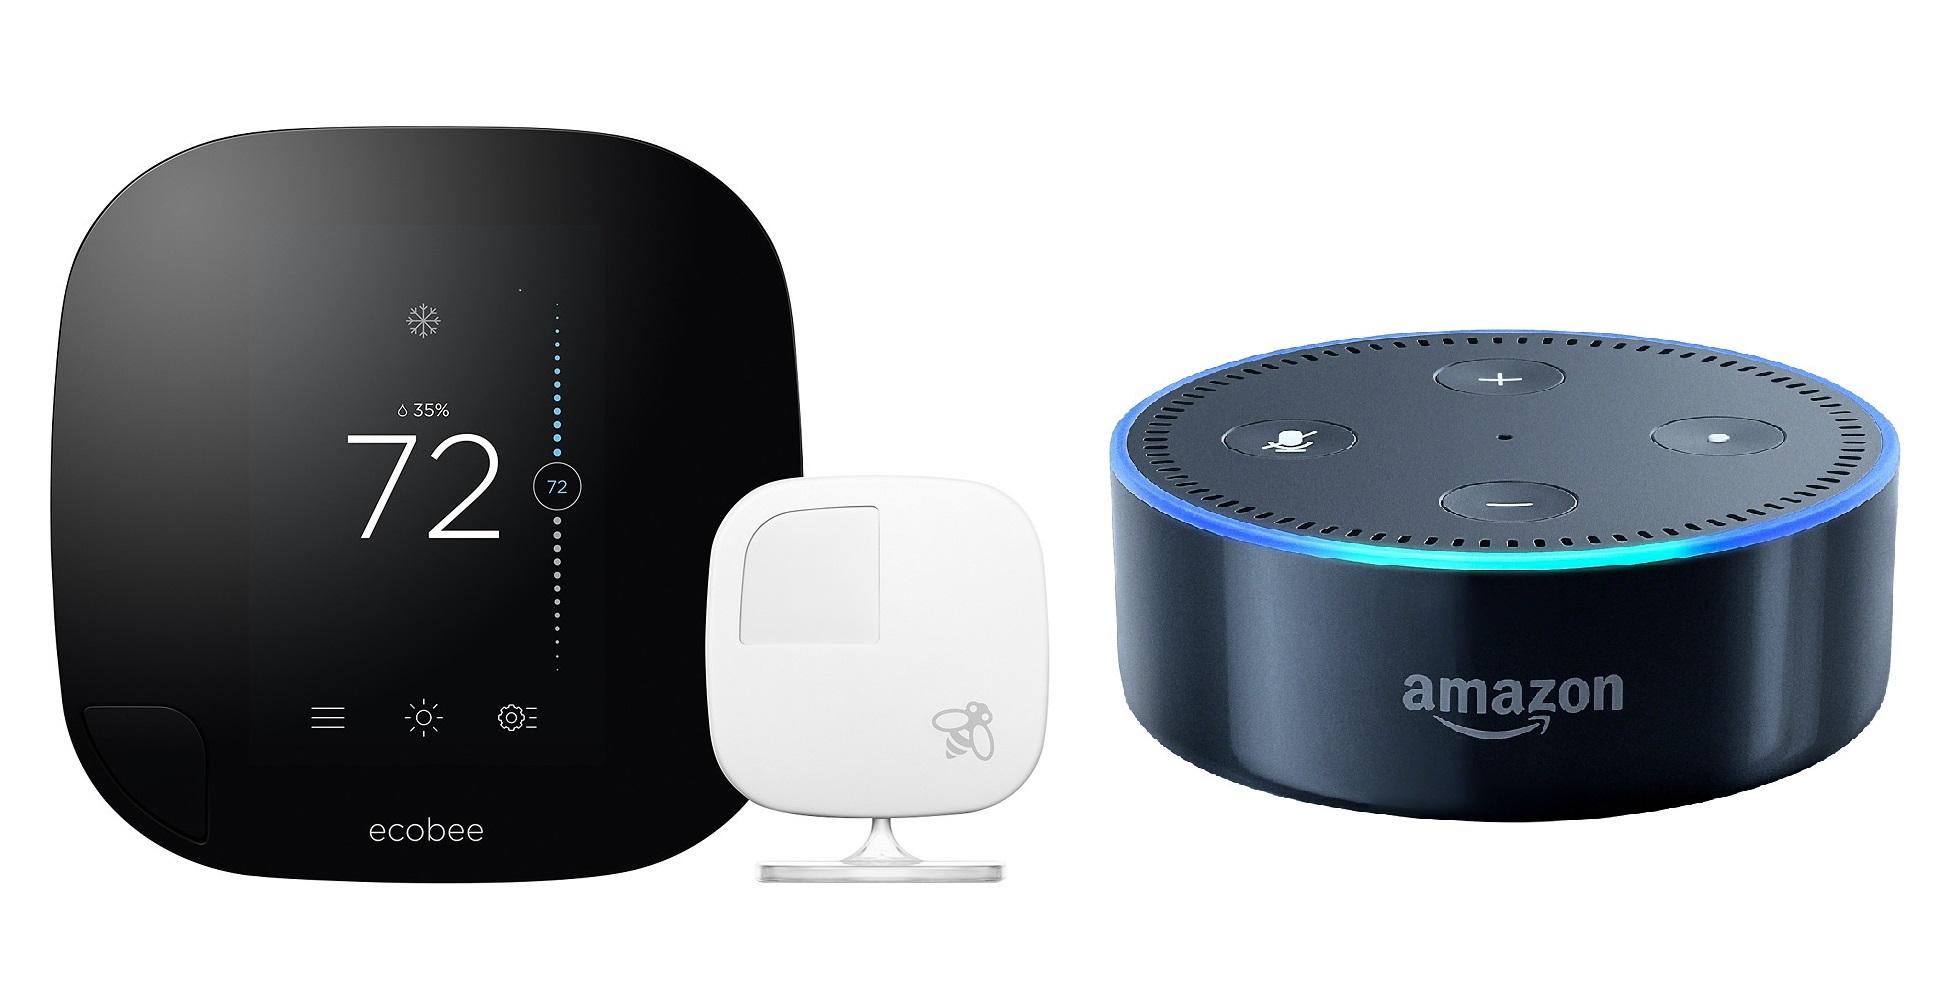 ecobee3 Touchscreen Wi-Fi Thermostat + Amazon Echo Dot (Pre-Order)  $200 + Free Shipping